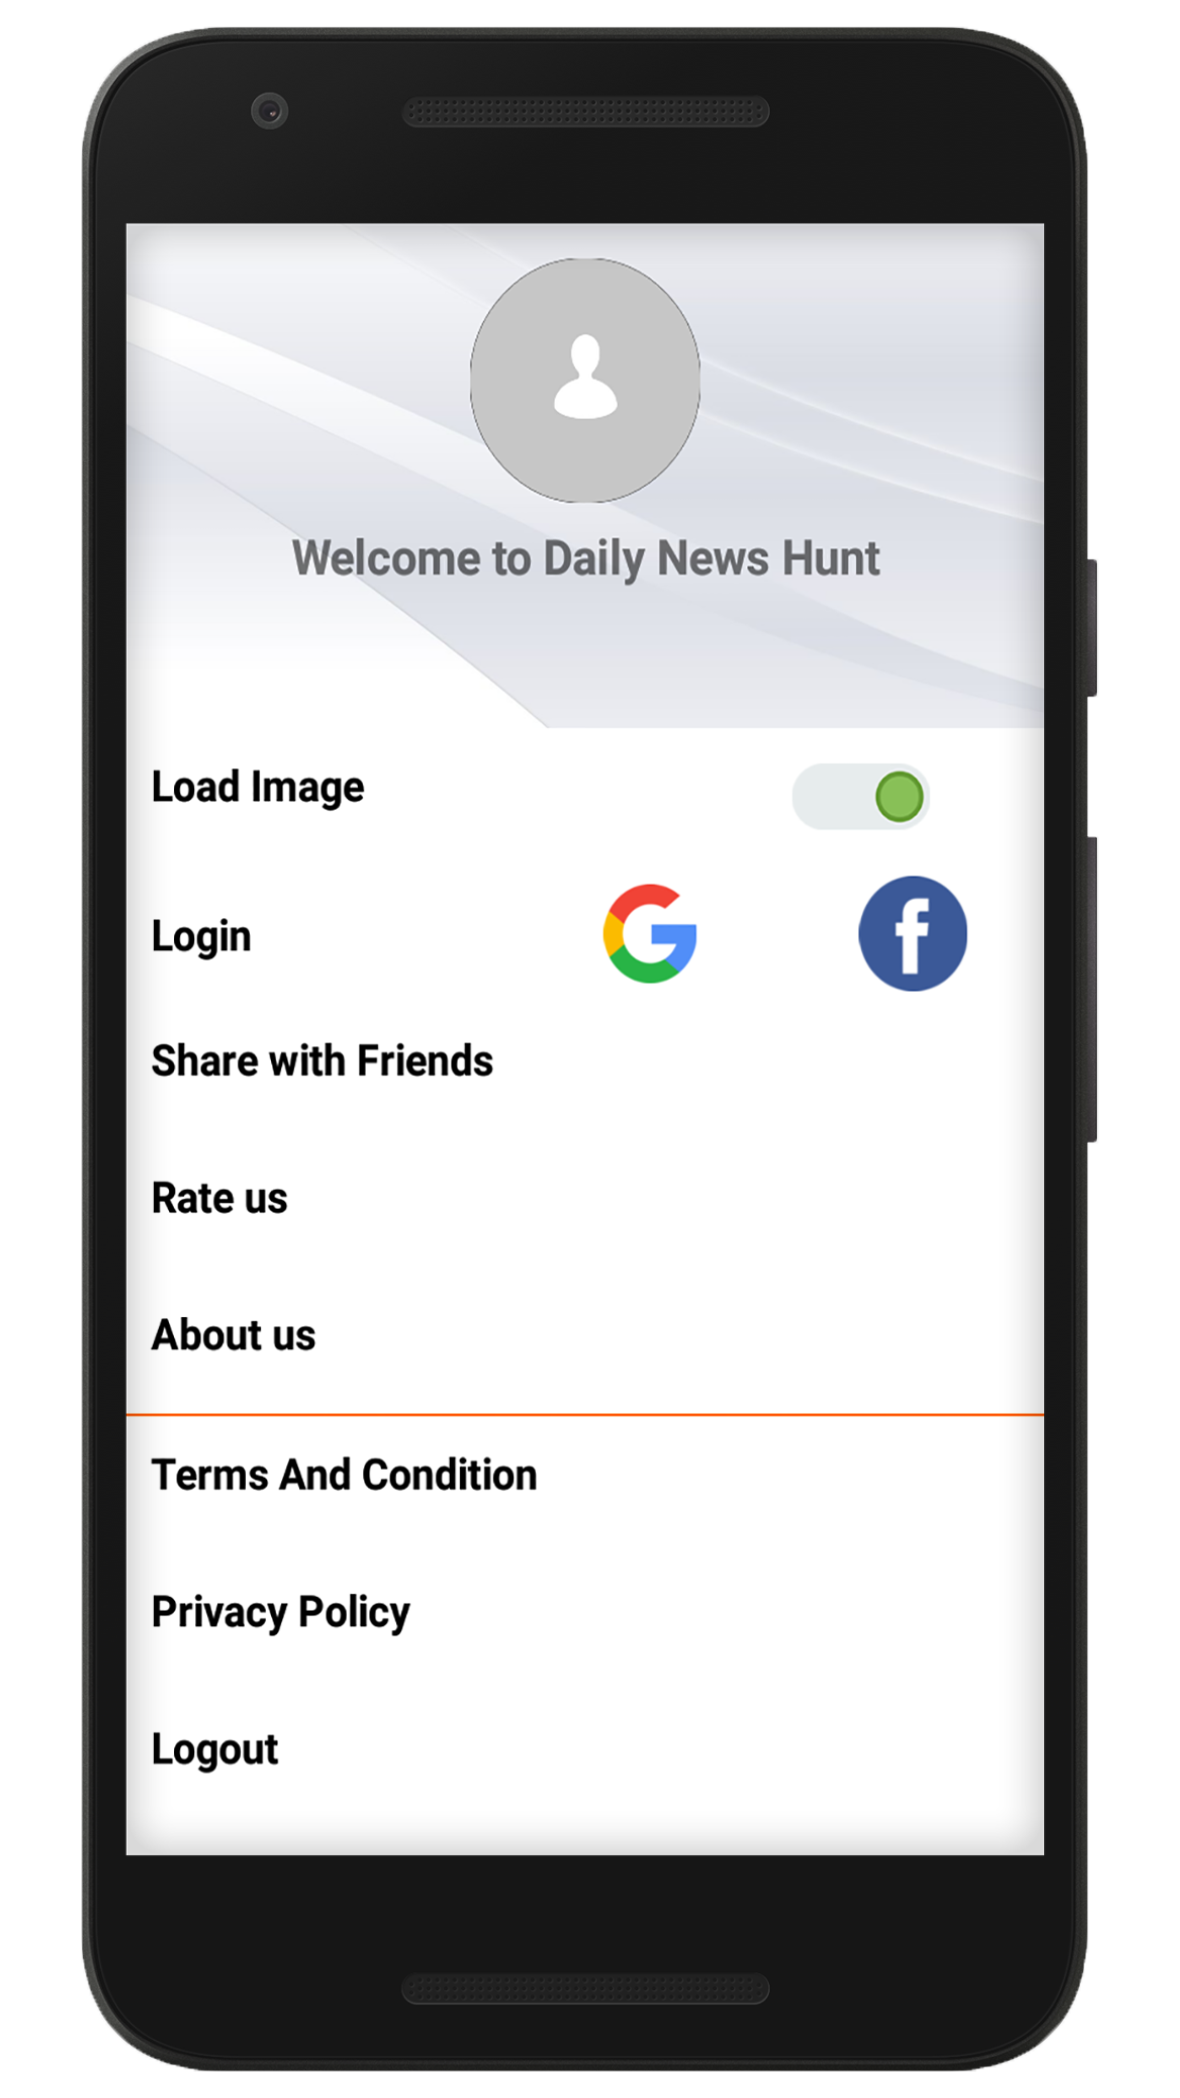 Daily News Hunt